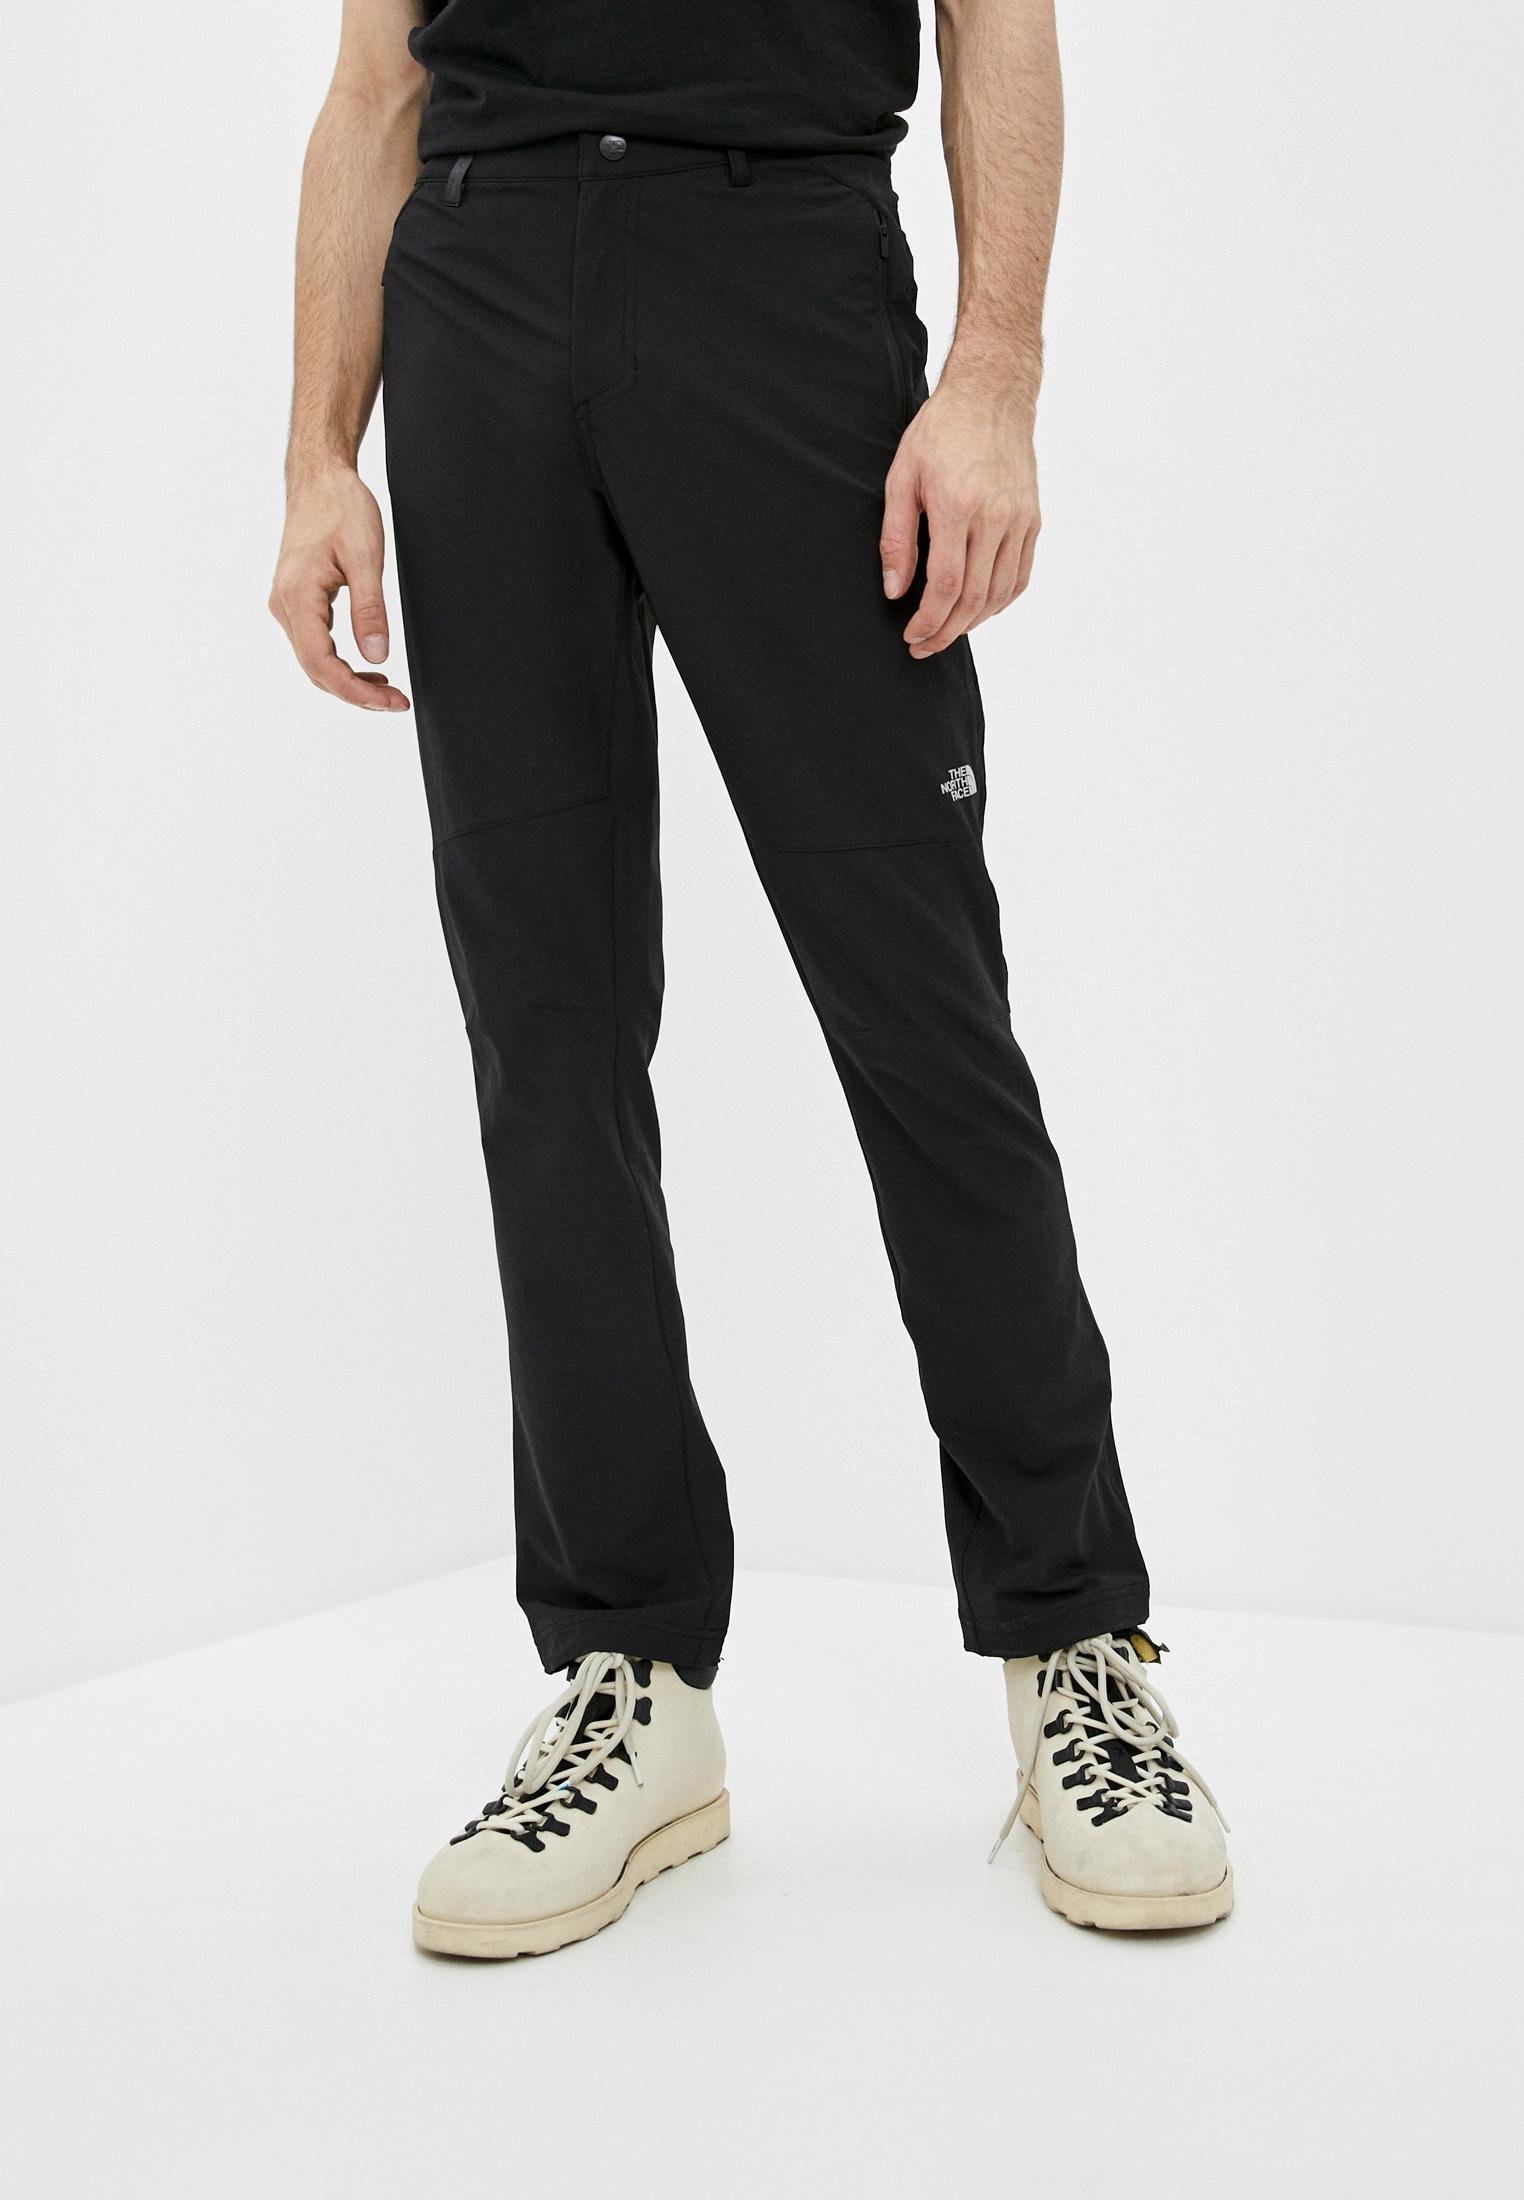 Мужские брюки The North Face (Зе Норт Фейс) T94M76